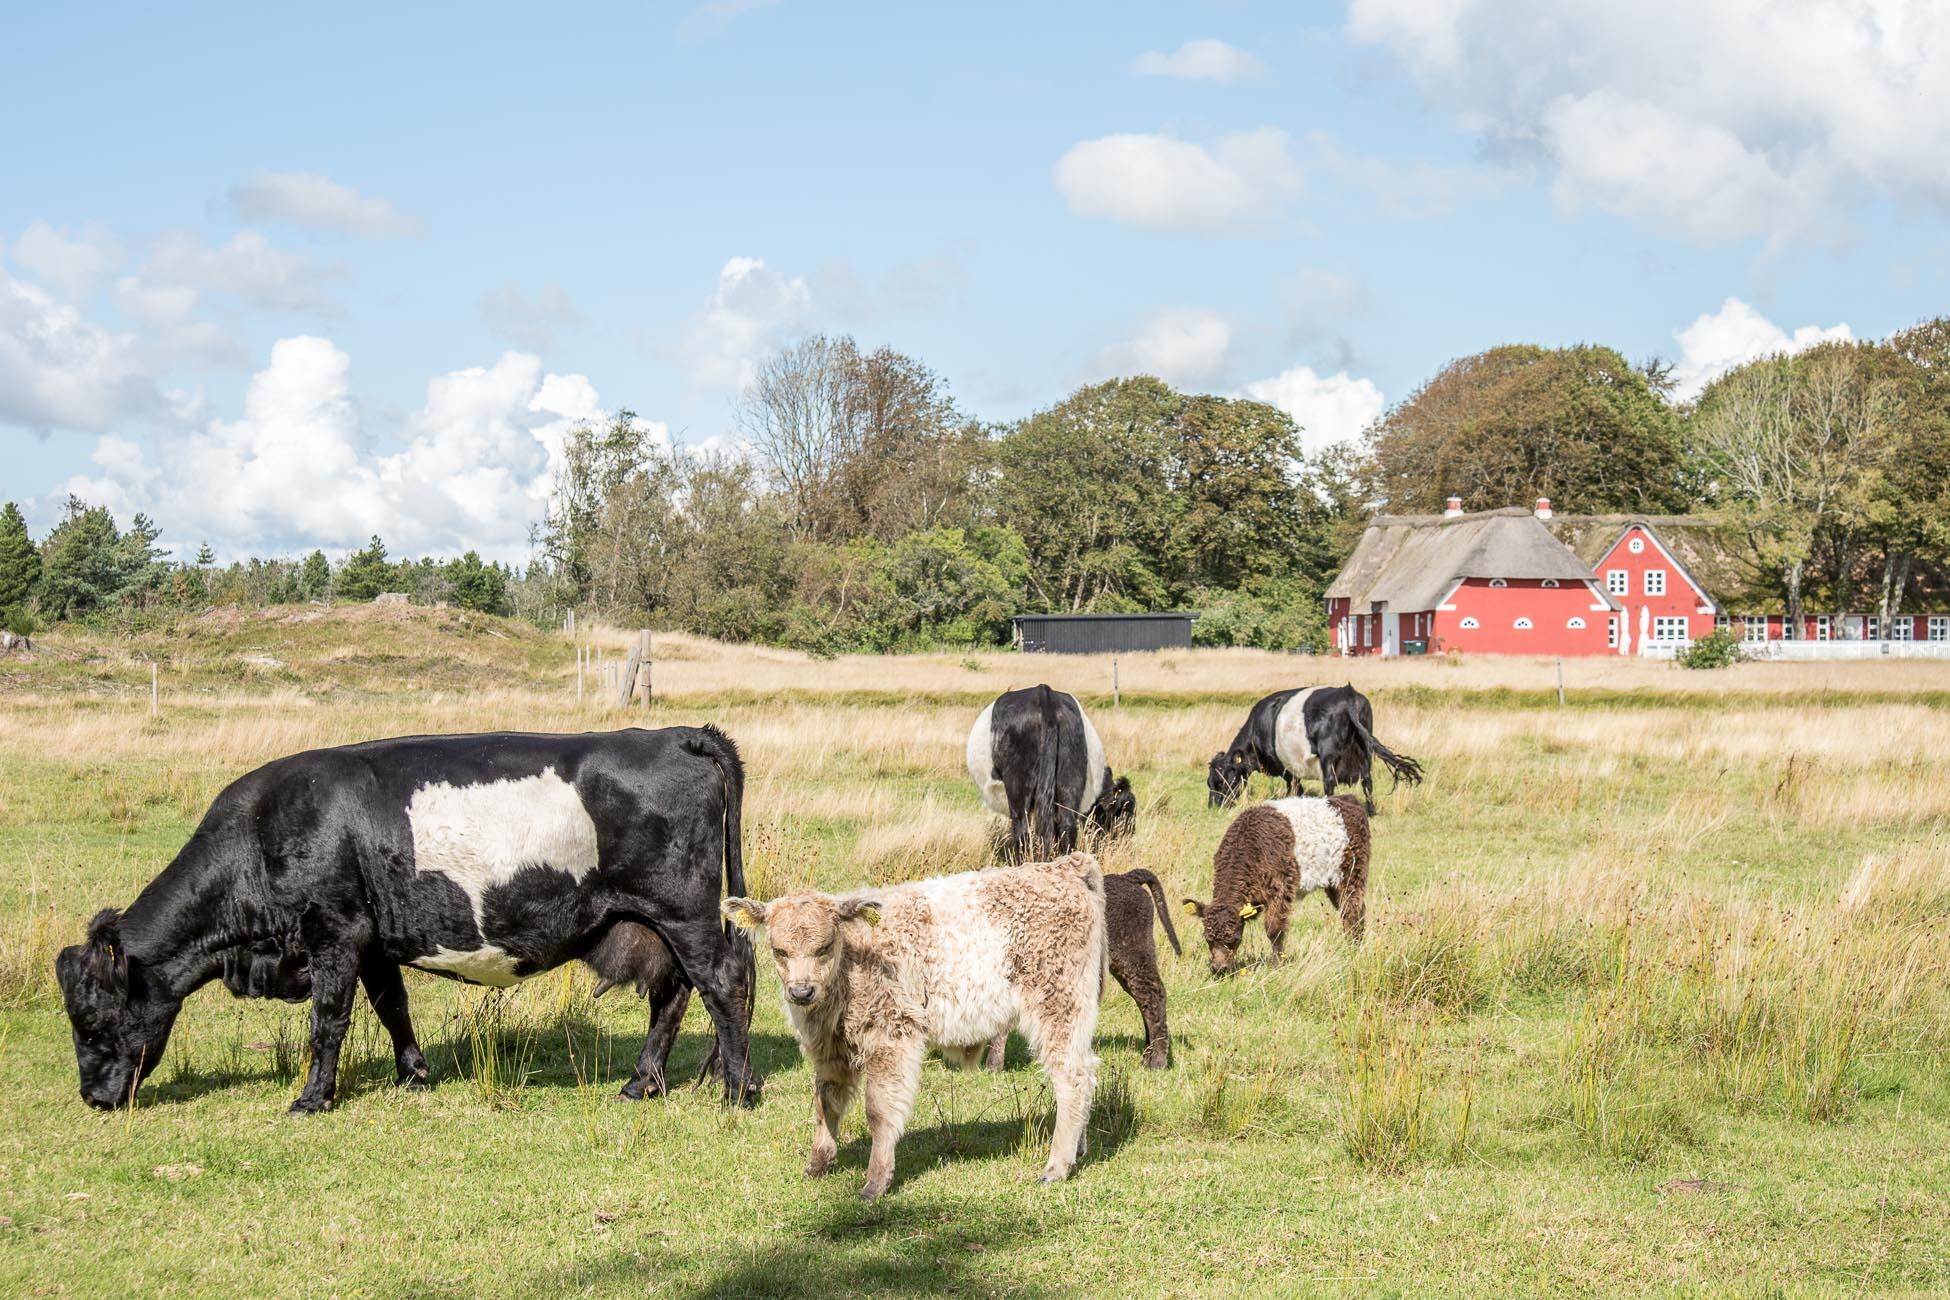 Insel Roemoe Dänemark Kühe